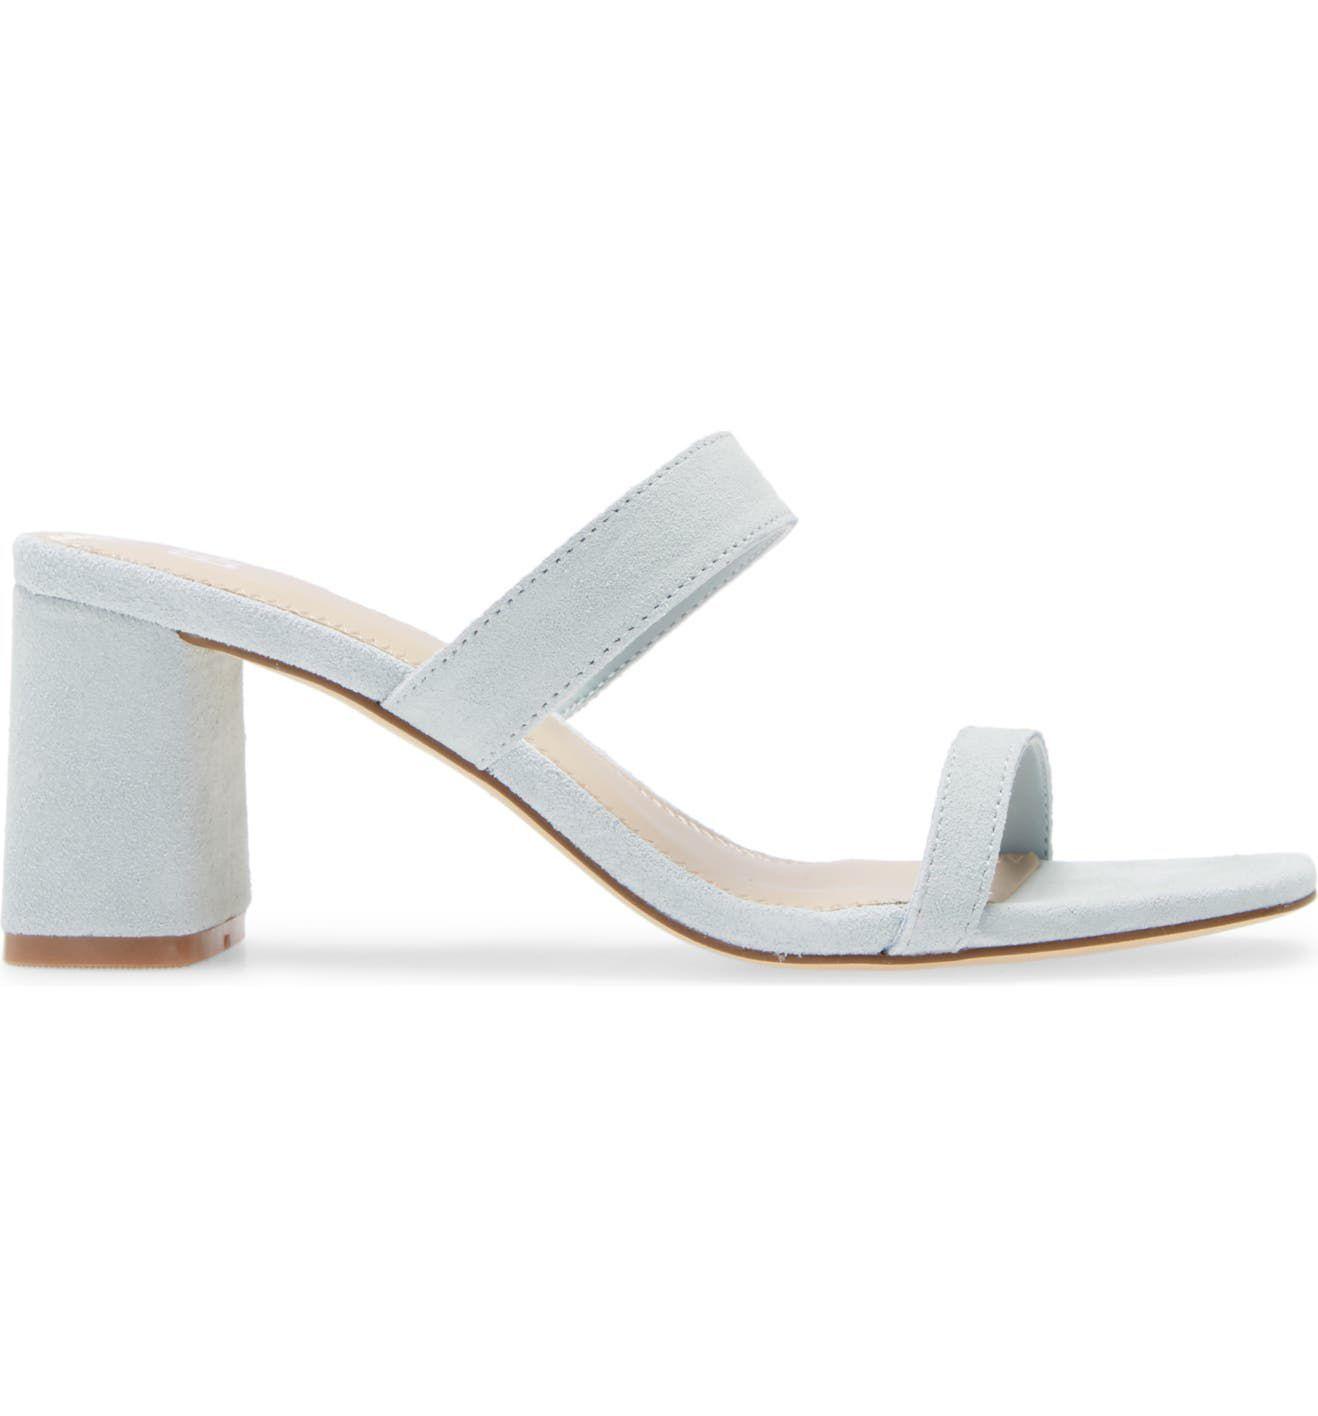 BP. Emmie Block Heel Slide Sandals